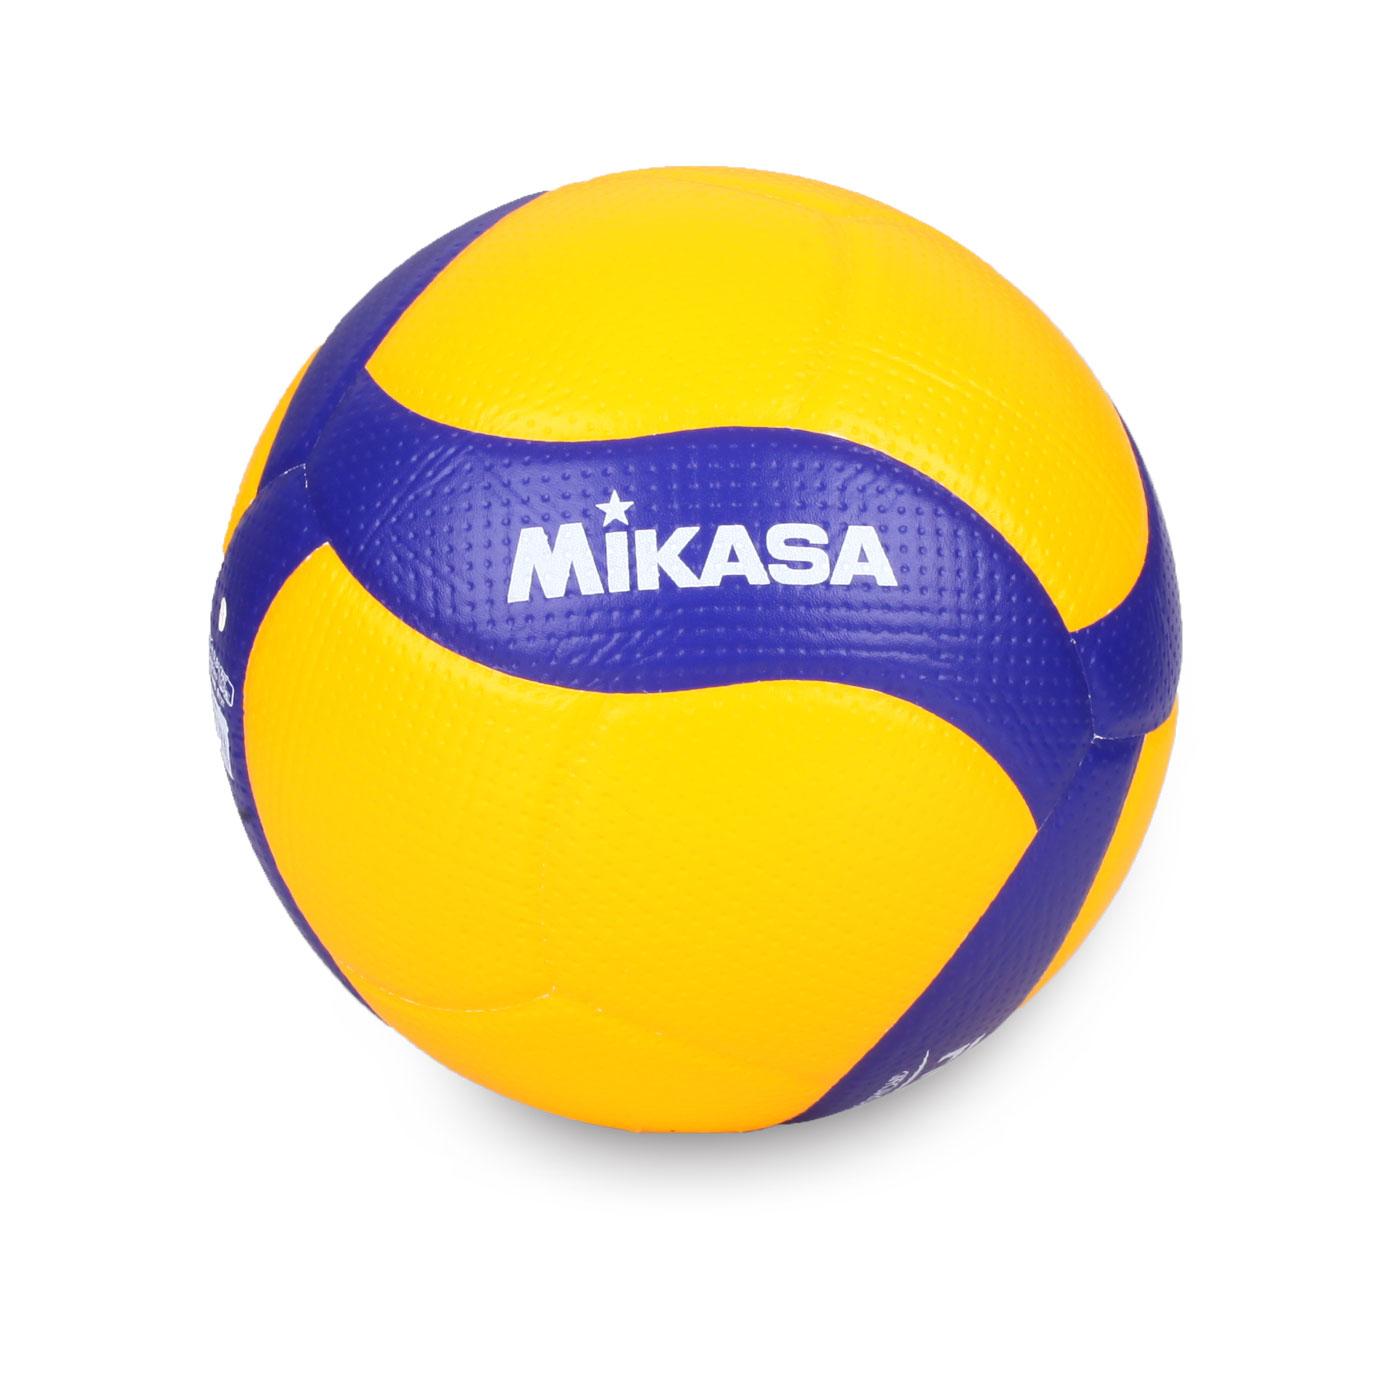 MIKASA 超纖皮製比賽級排球 #5  V200W - 黃藍